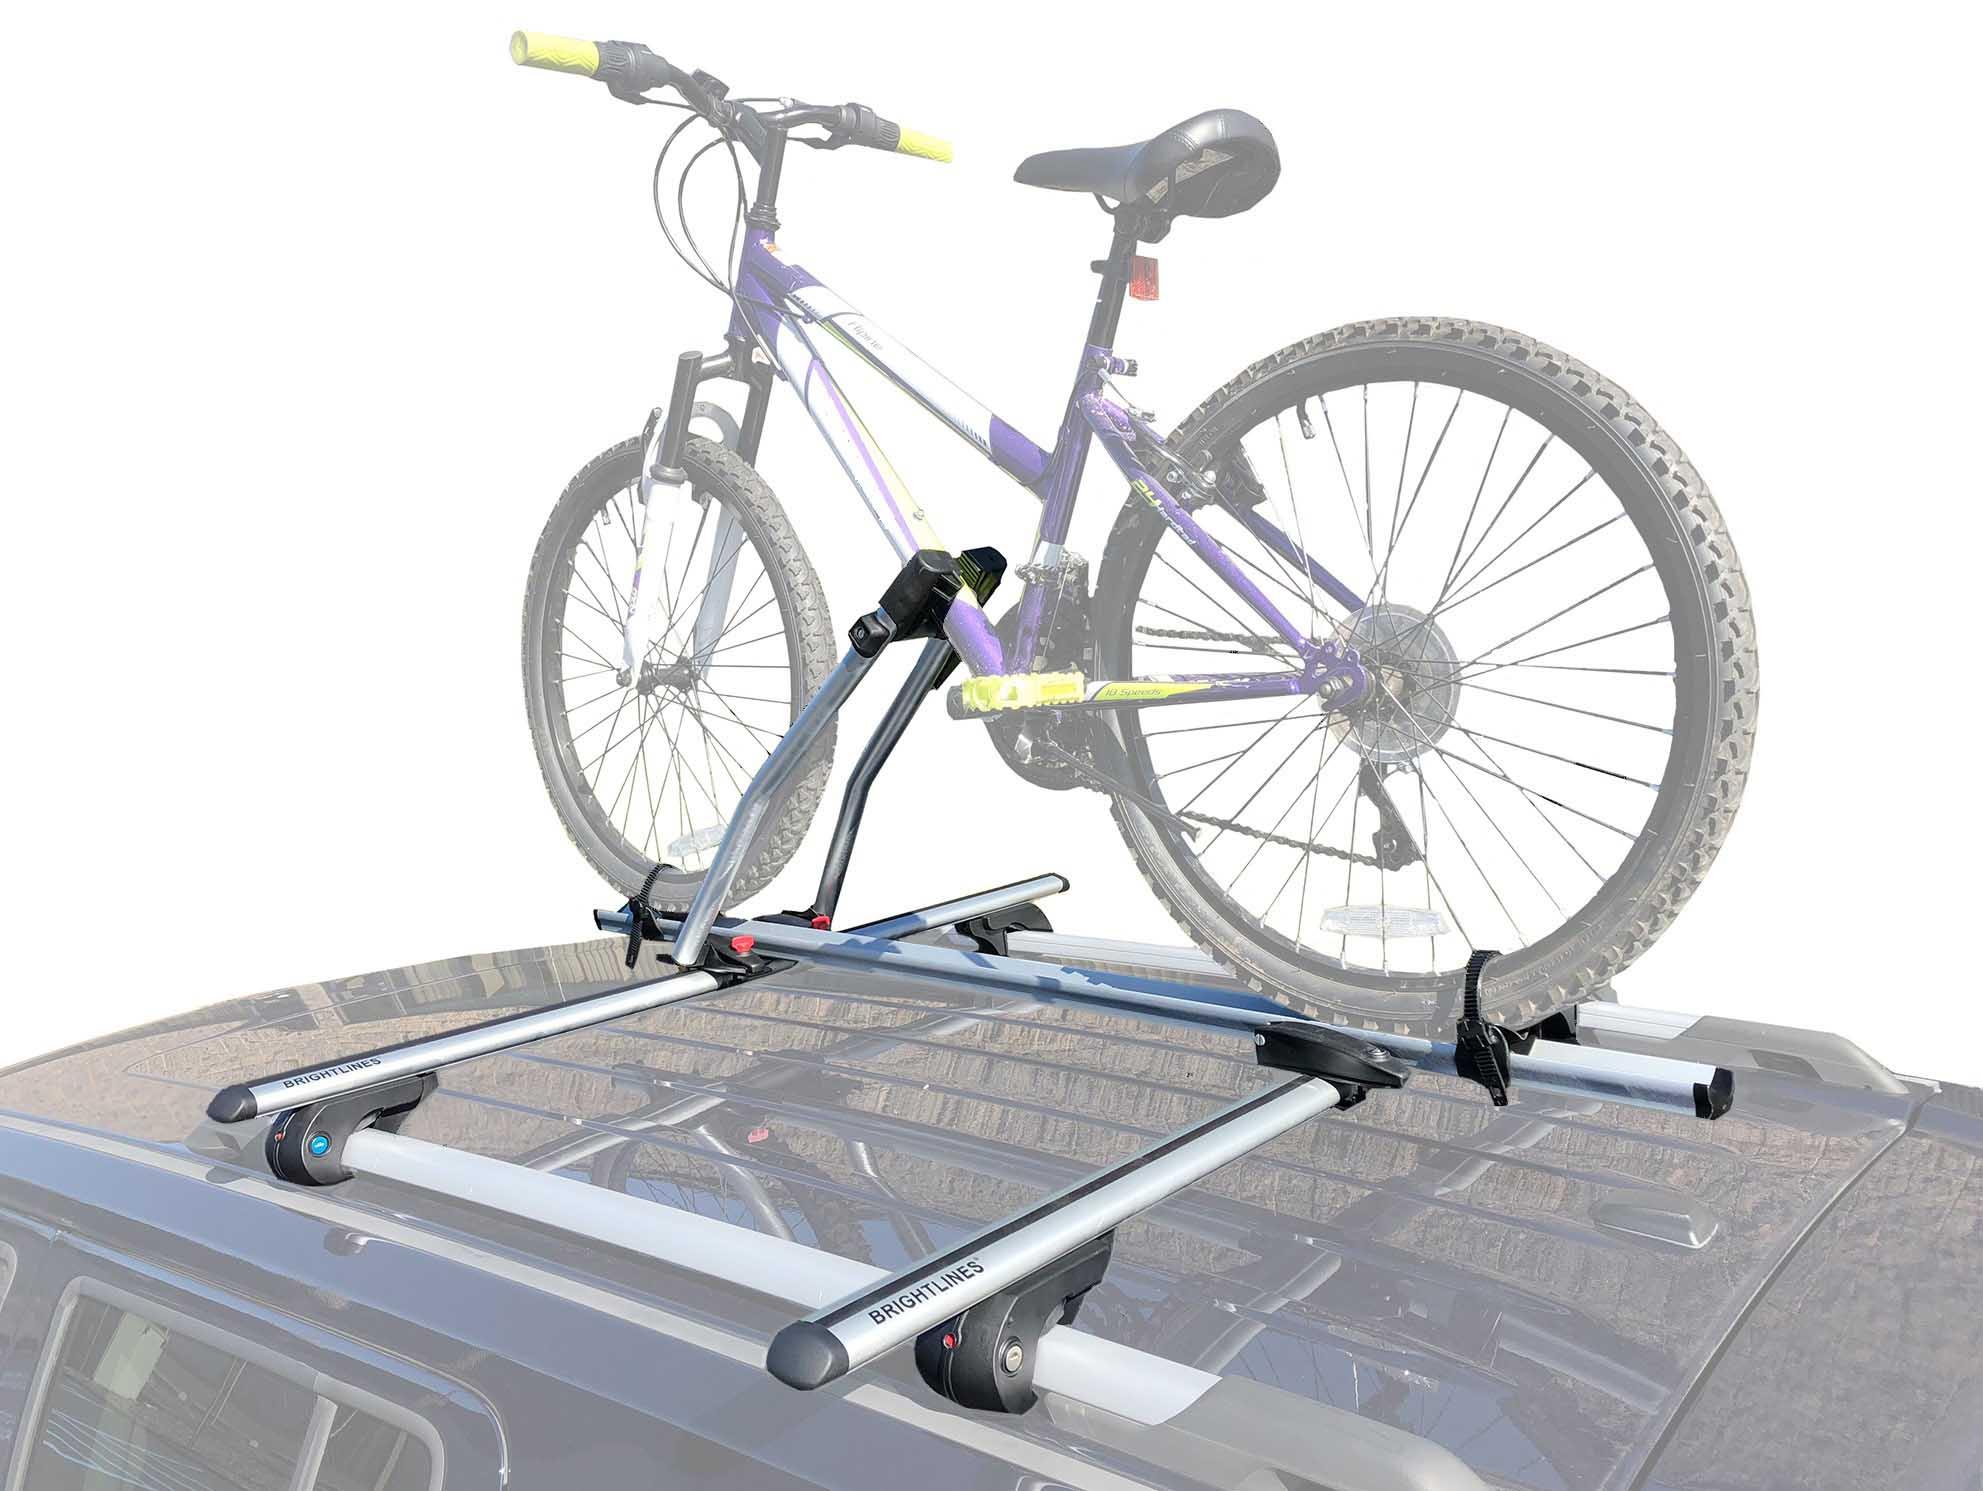 brightlines cadillac srx roof racks cross bars bike rack combo 2004 2015 [ 1983 x 1491 Pixel ]